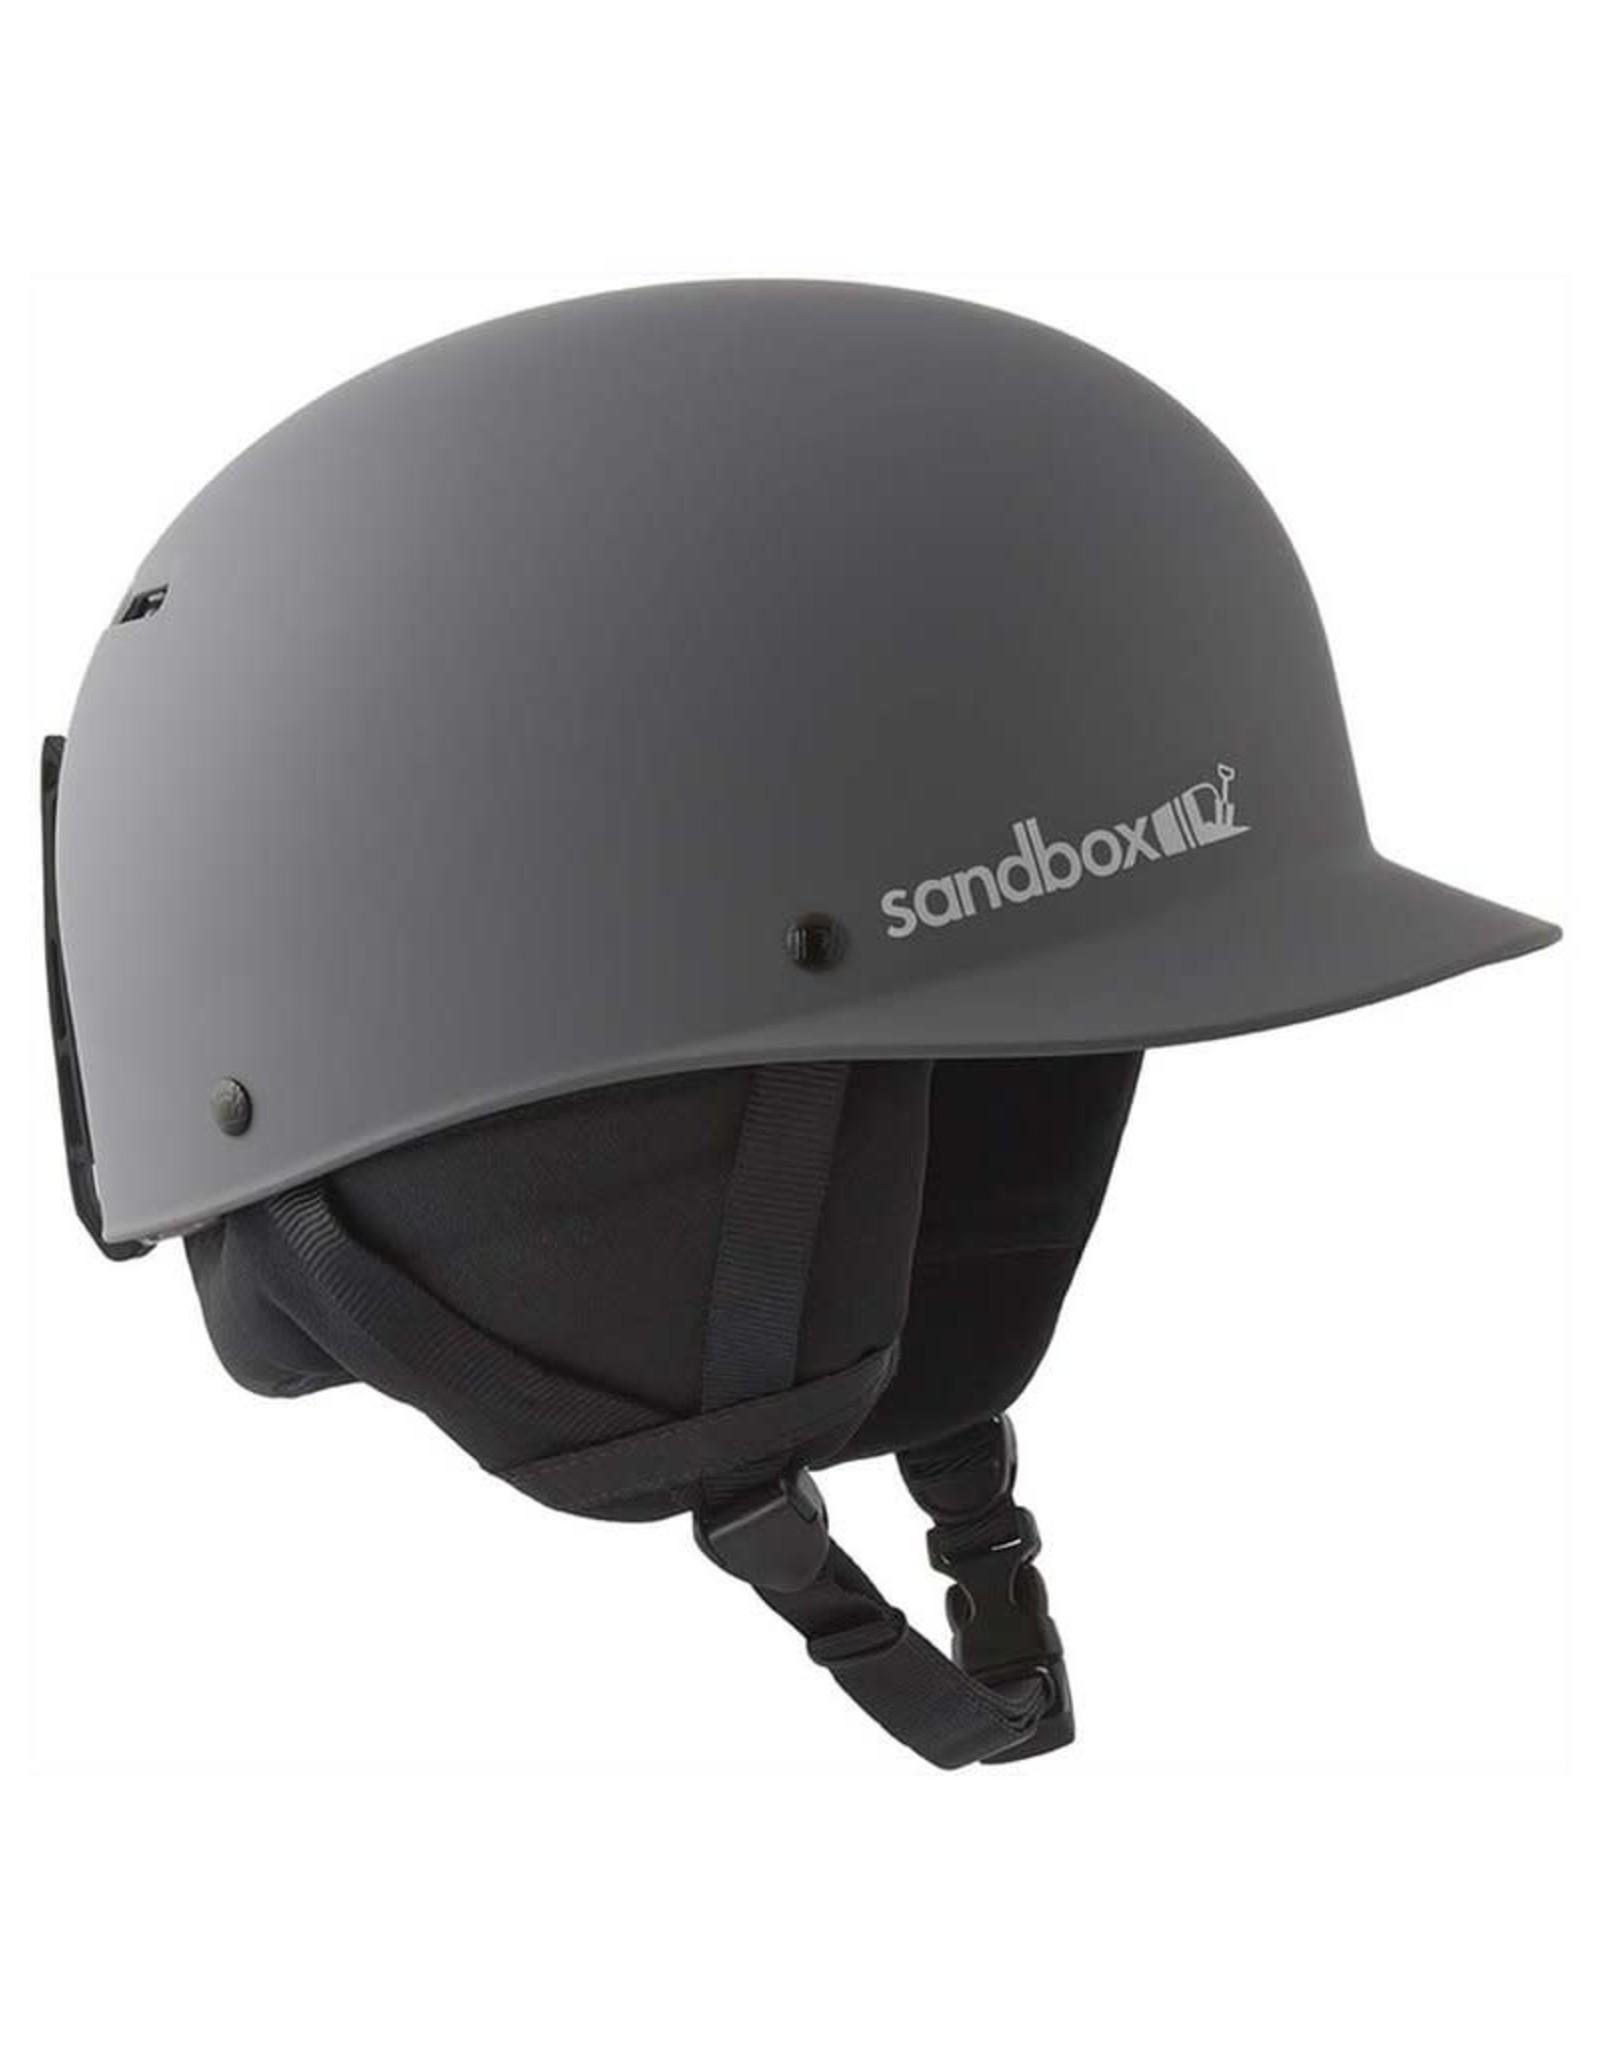 Sandbox 2020 Sandbox 2.0 Snow Helmet Grey Size Small